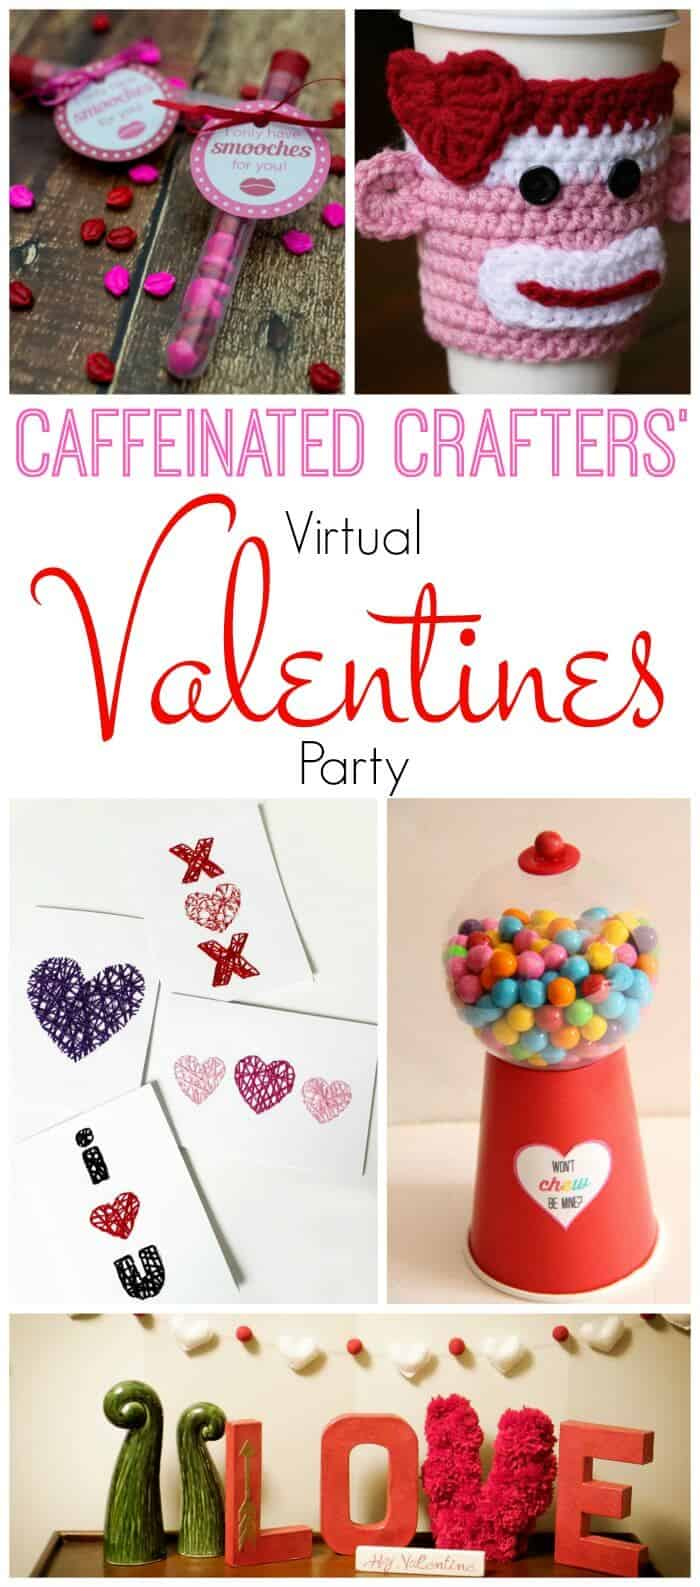 CC-Virtual-Valentines-Party